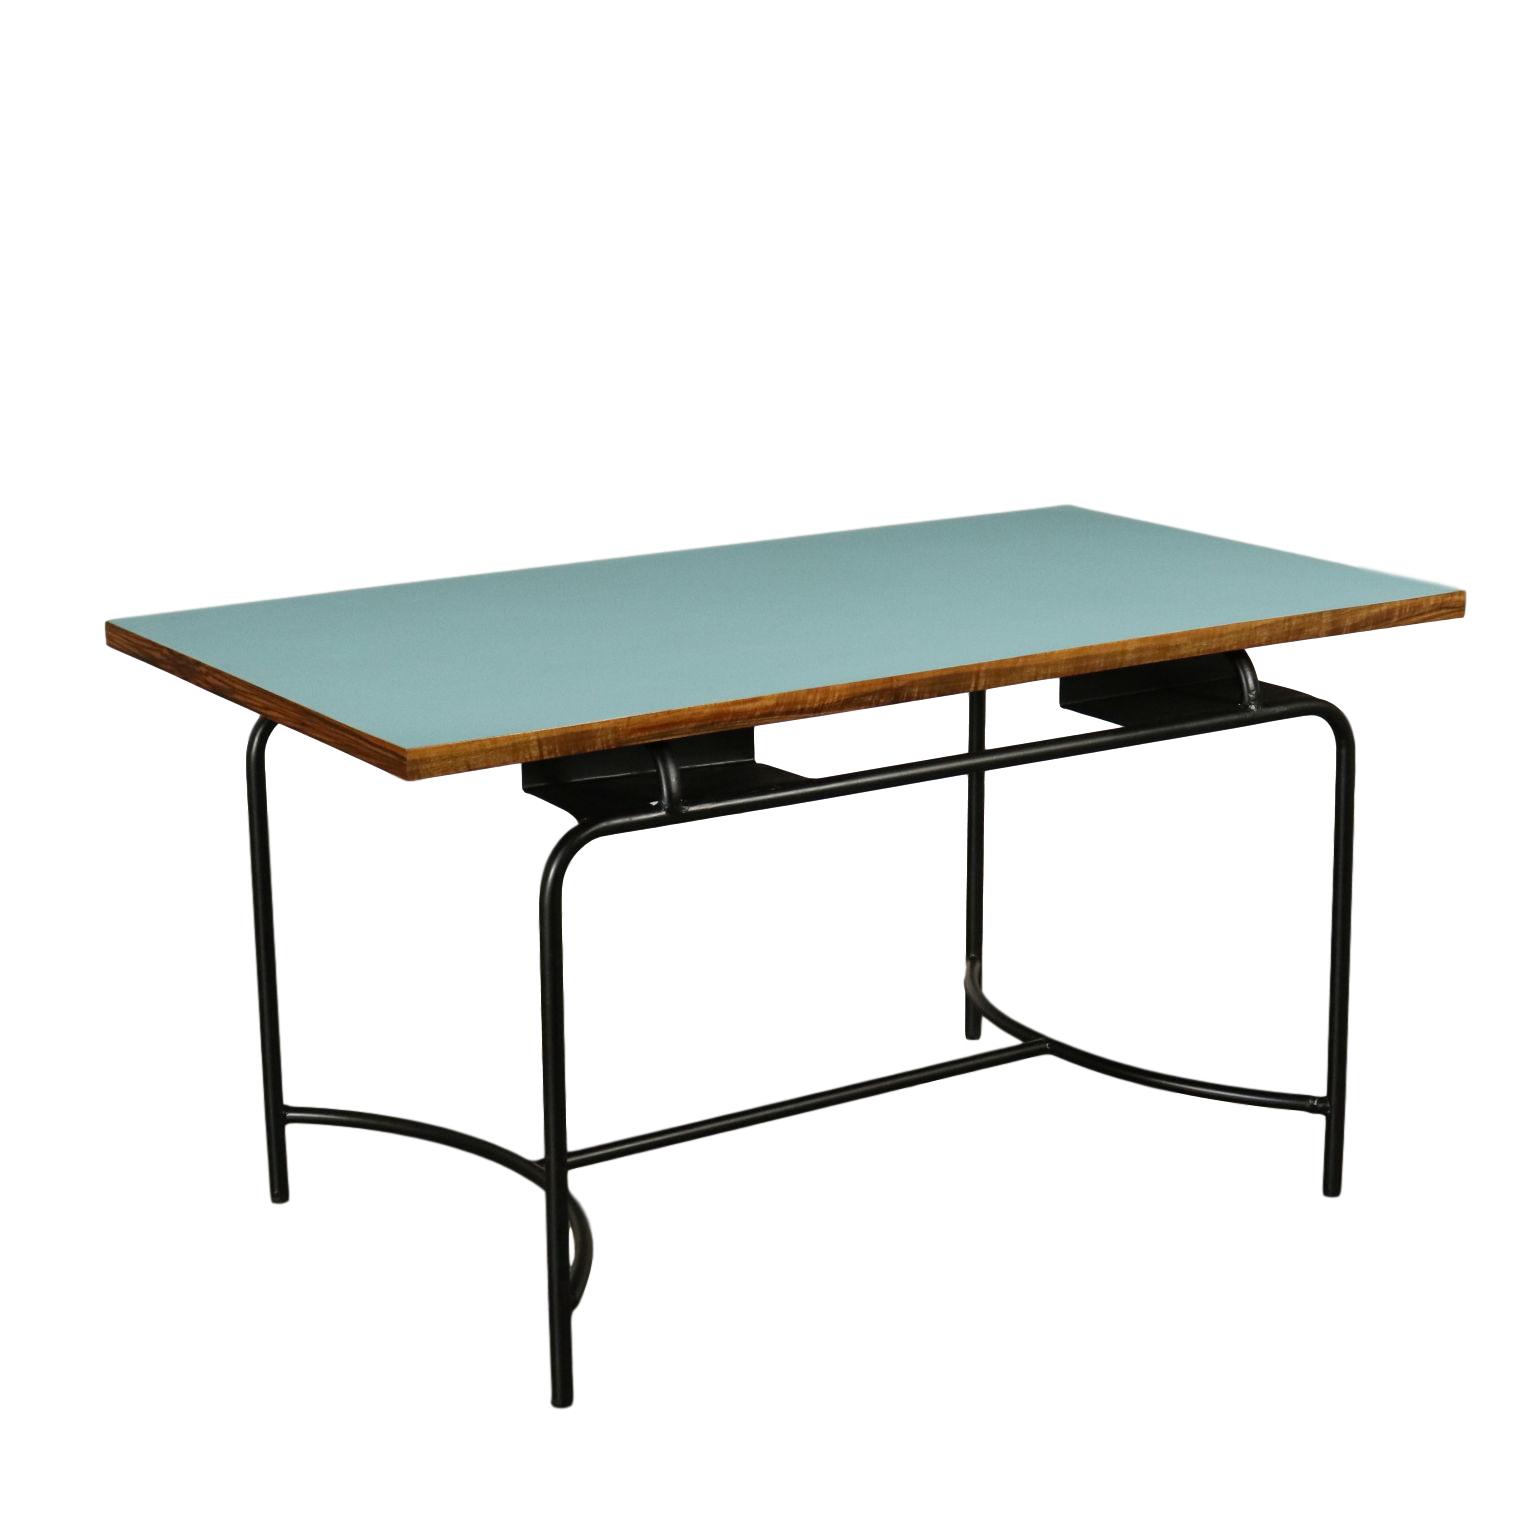 Tavolo Formica Vintage.Table Formica Wood Metal Vintage Italy 1960s